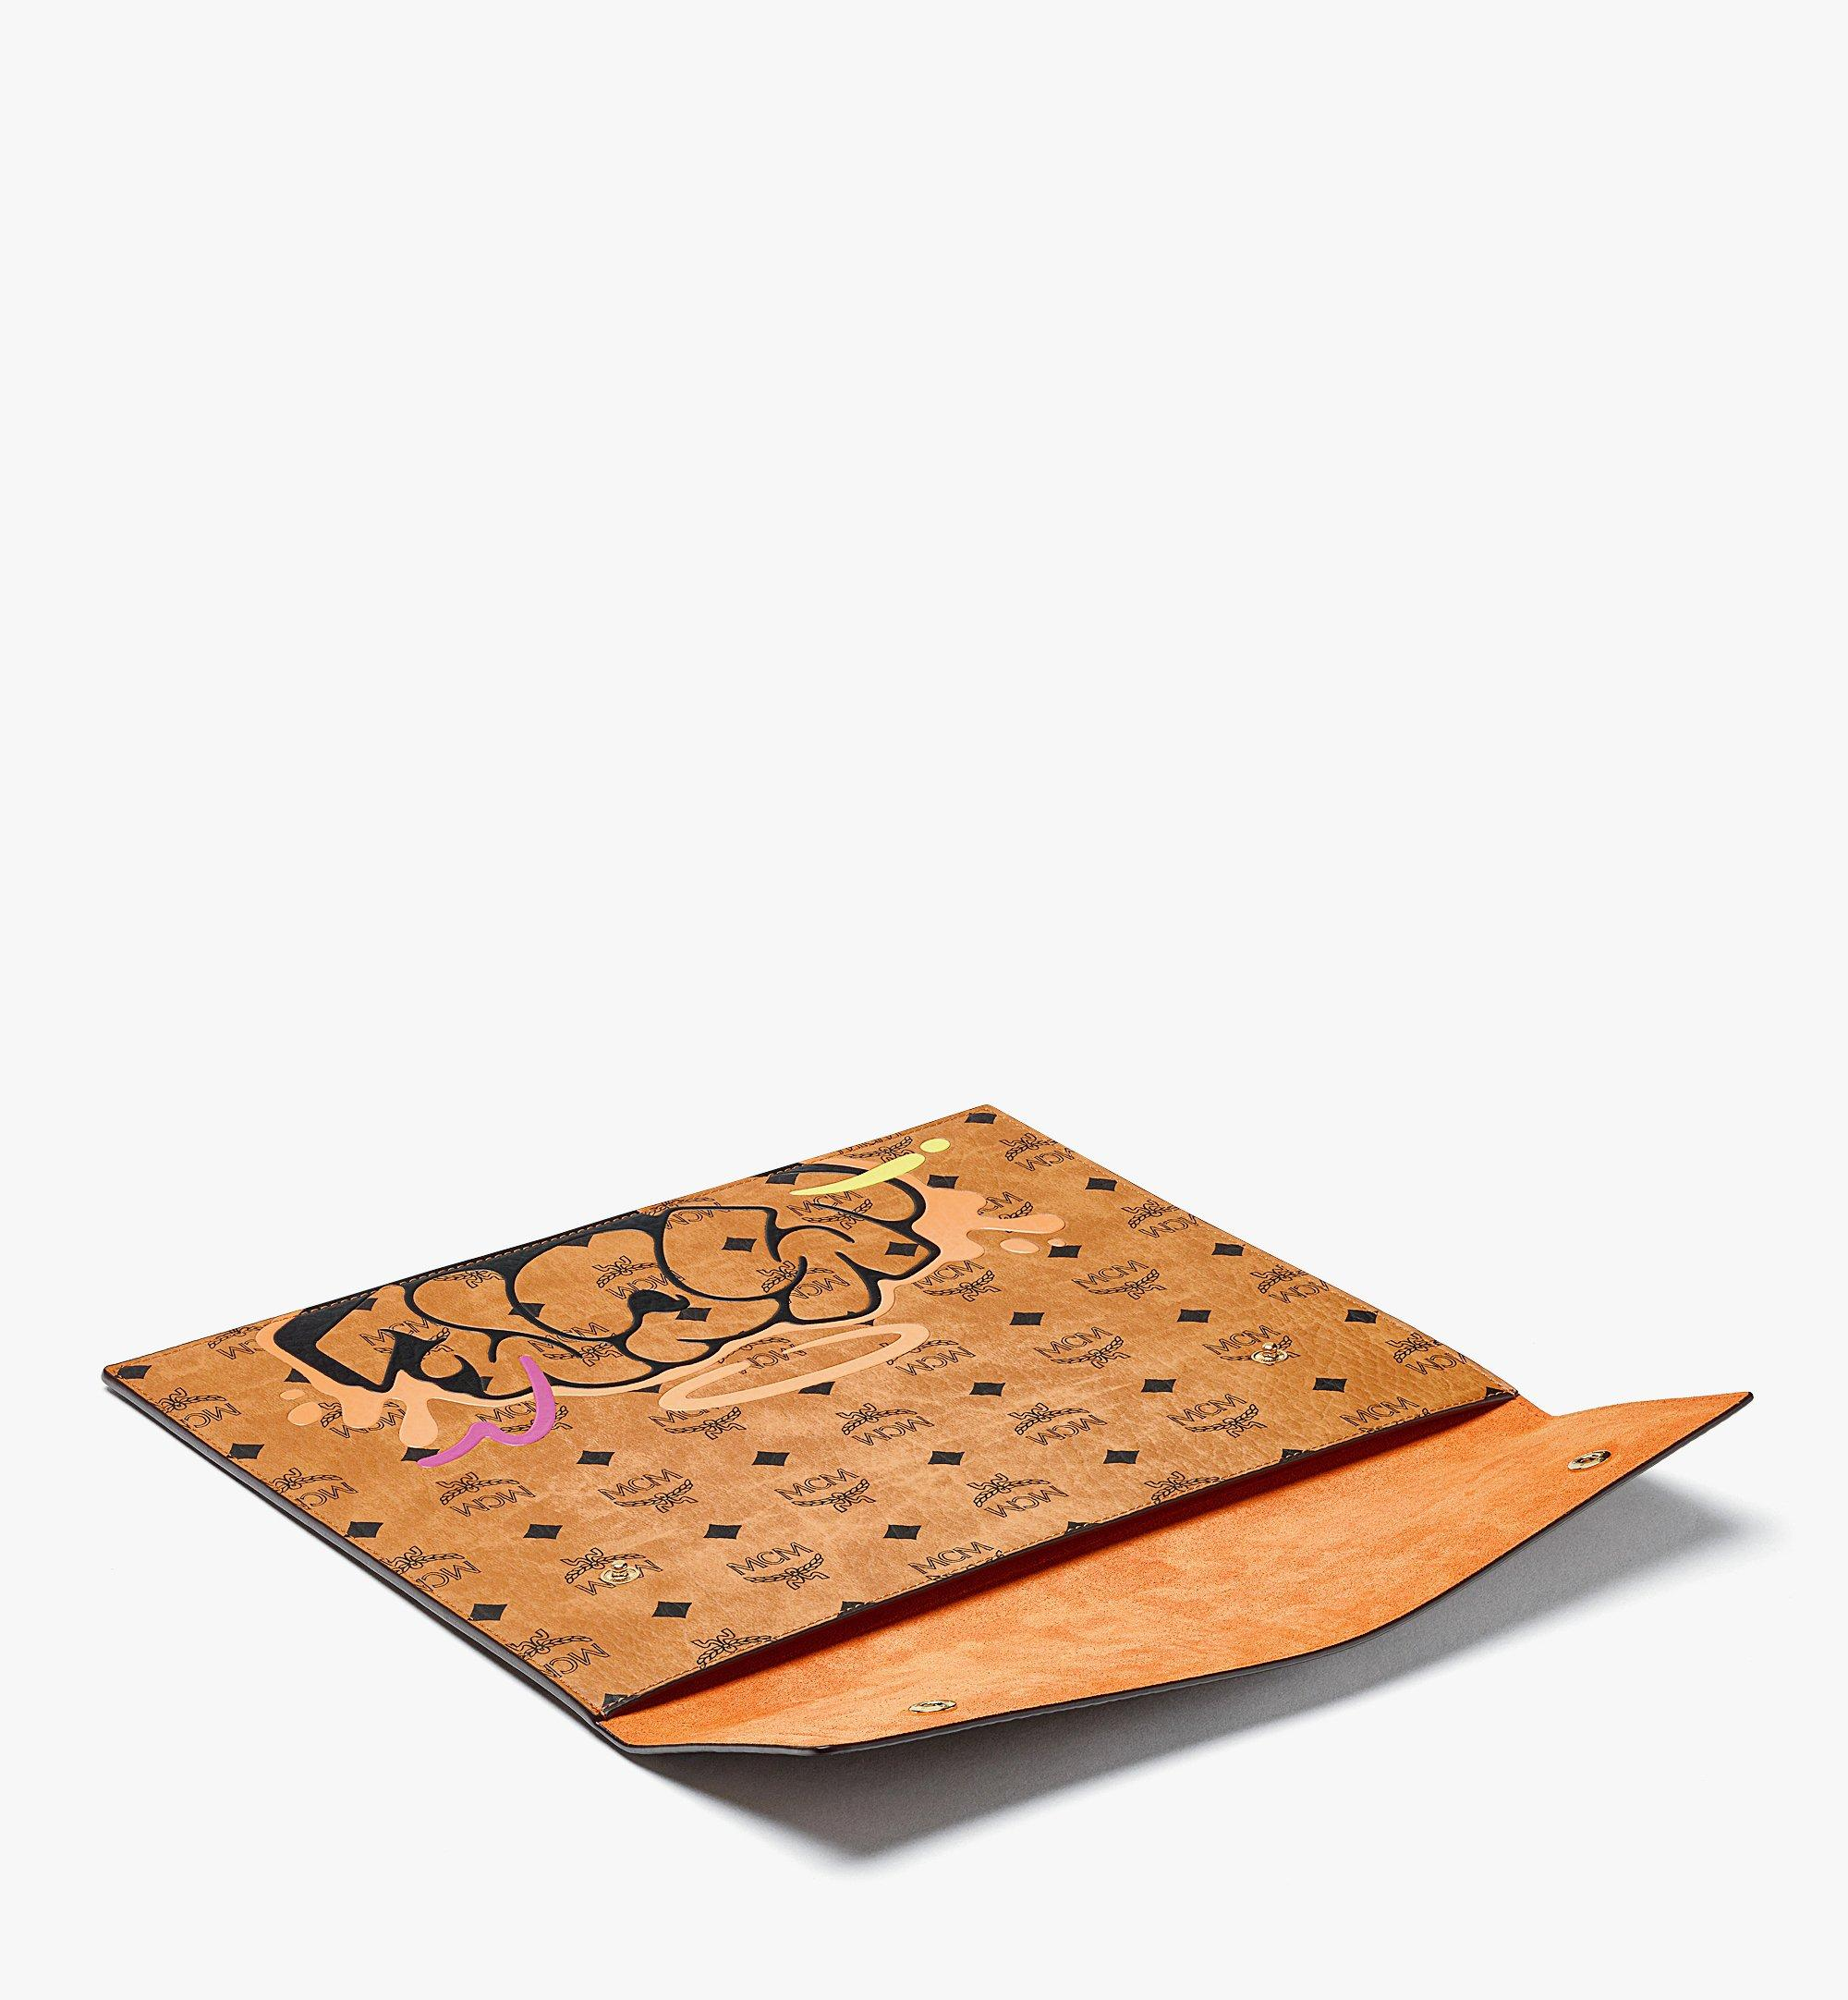 MCM MCM x SAMBYPEN iPad Sleeve in Visetos Cognac MXEBASP01CO001 Alternate View 1